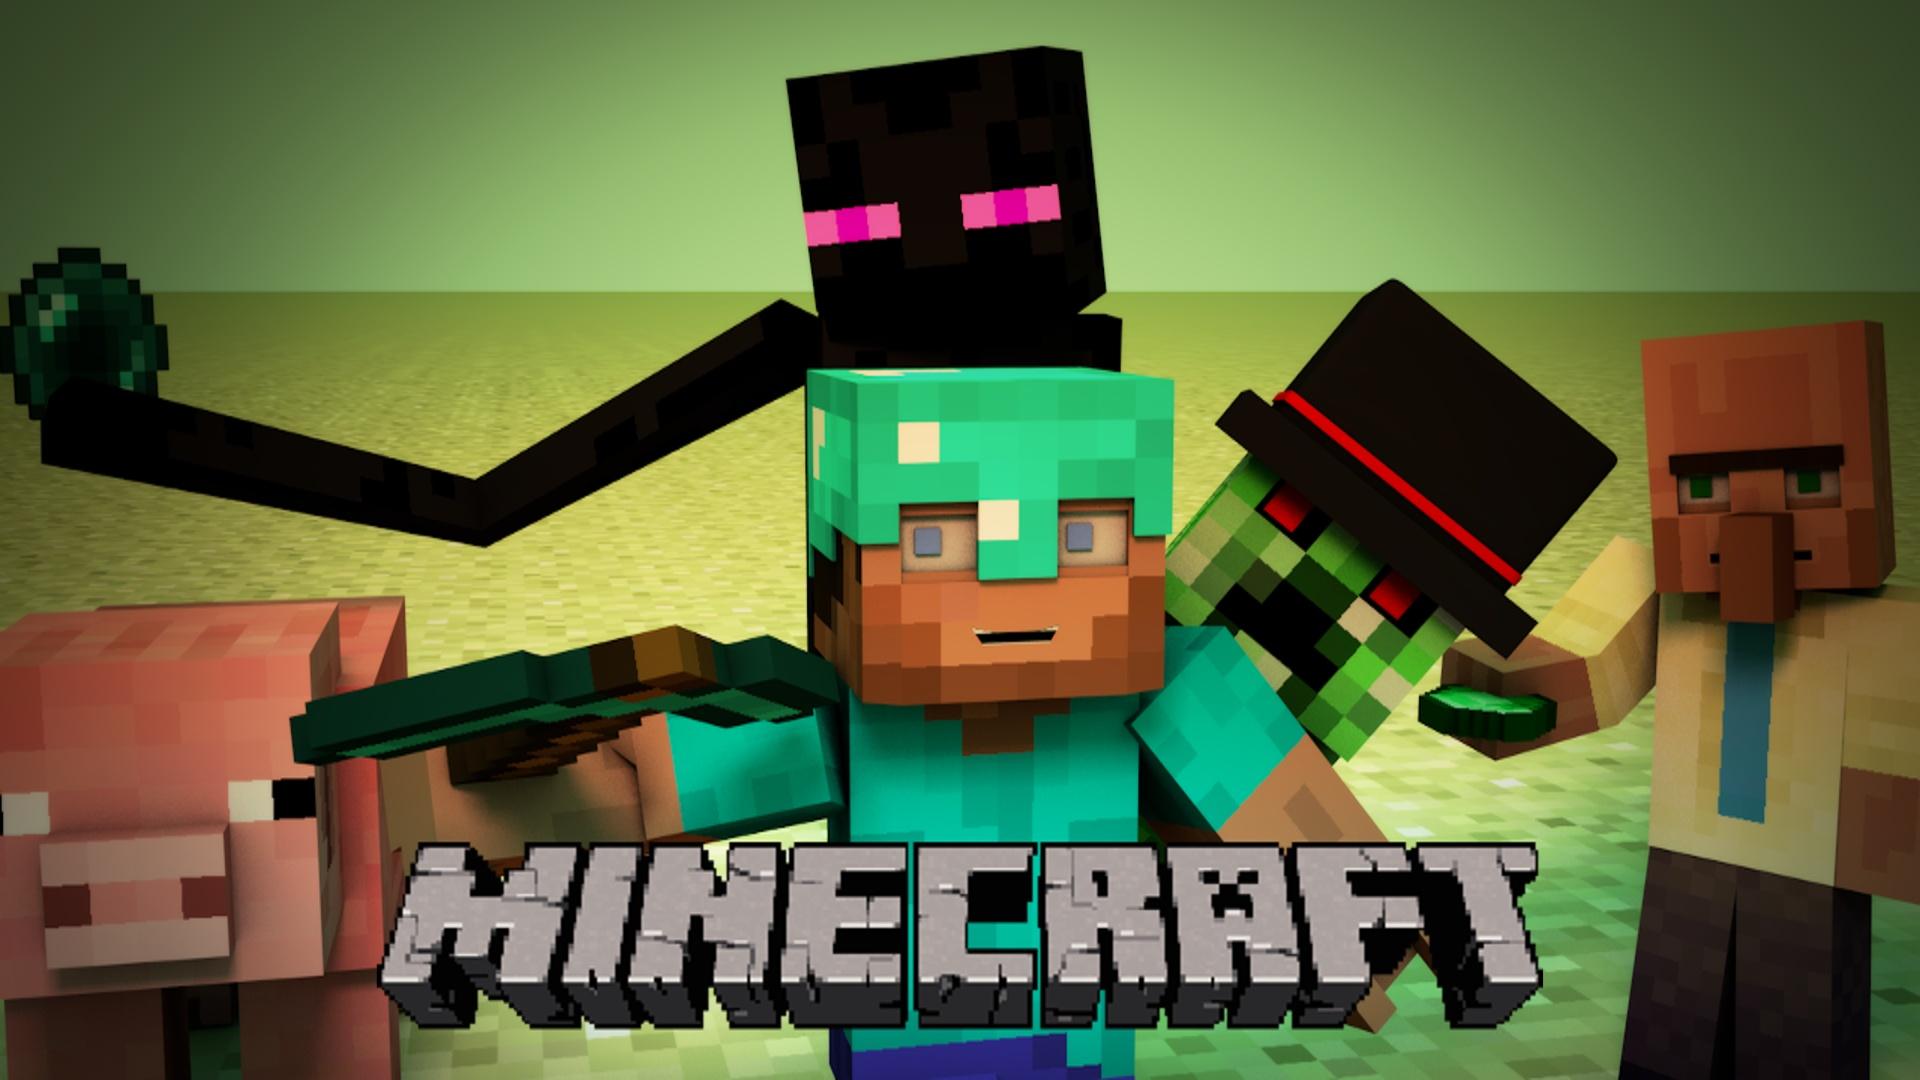 Minecraft Herobrine Pictures, Images & Photos | Photobucket